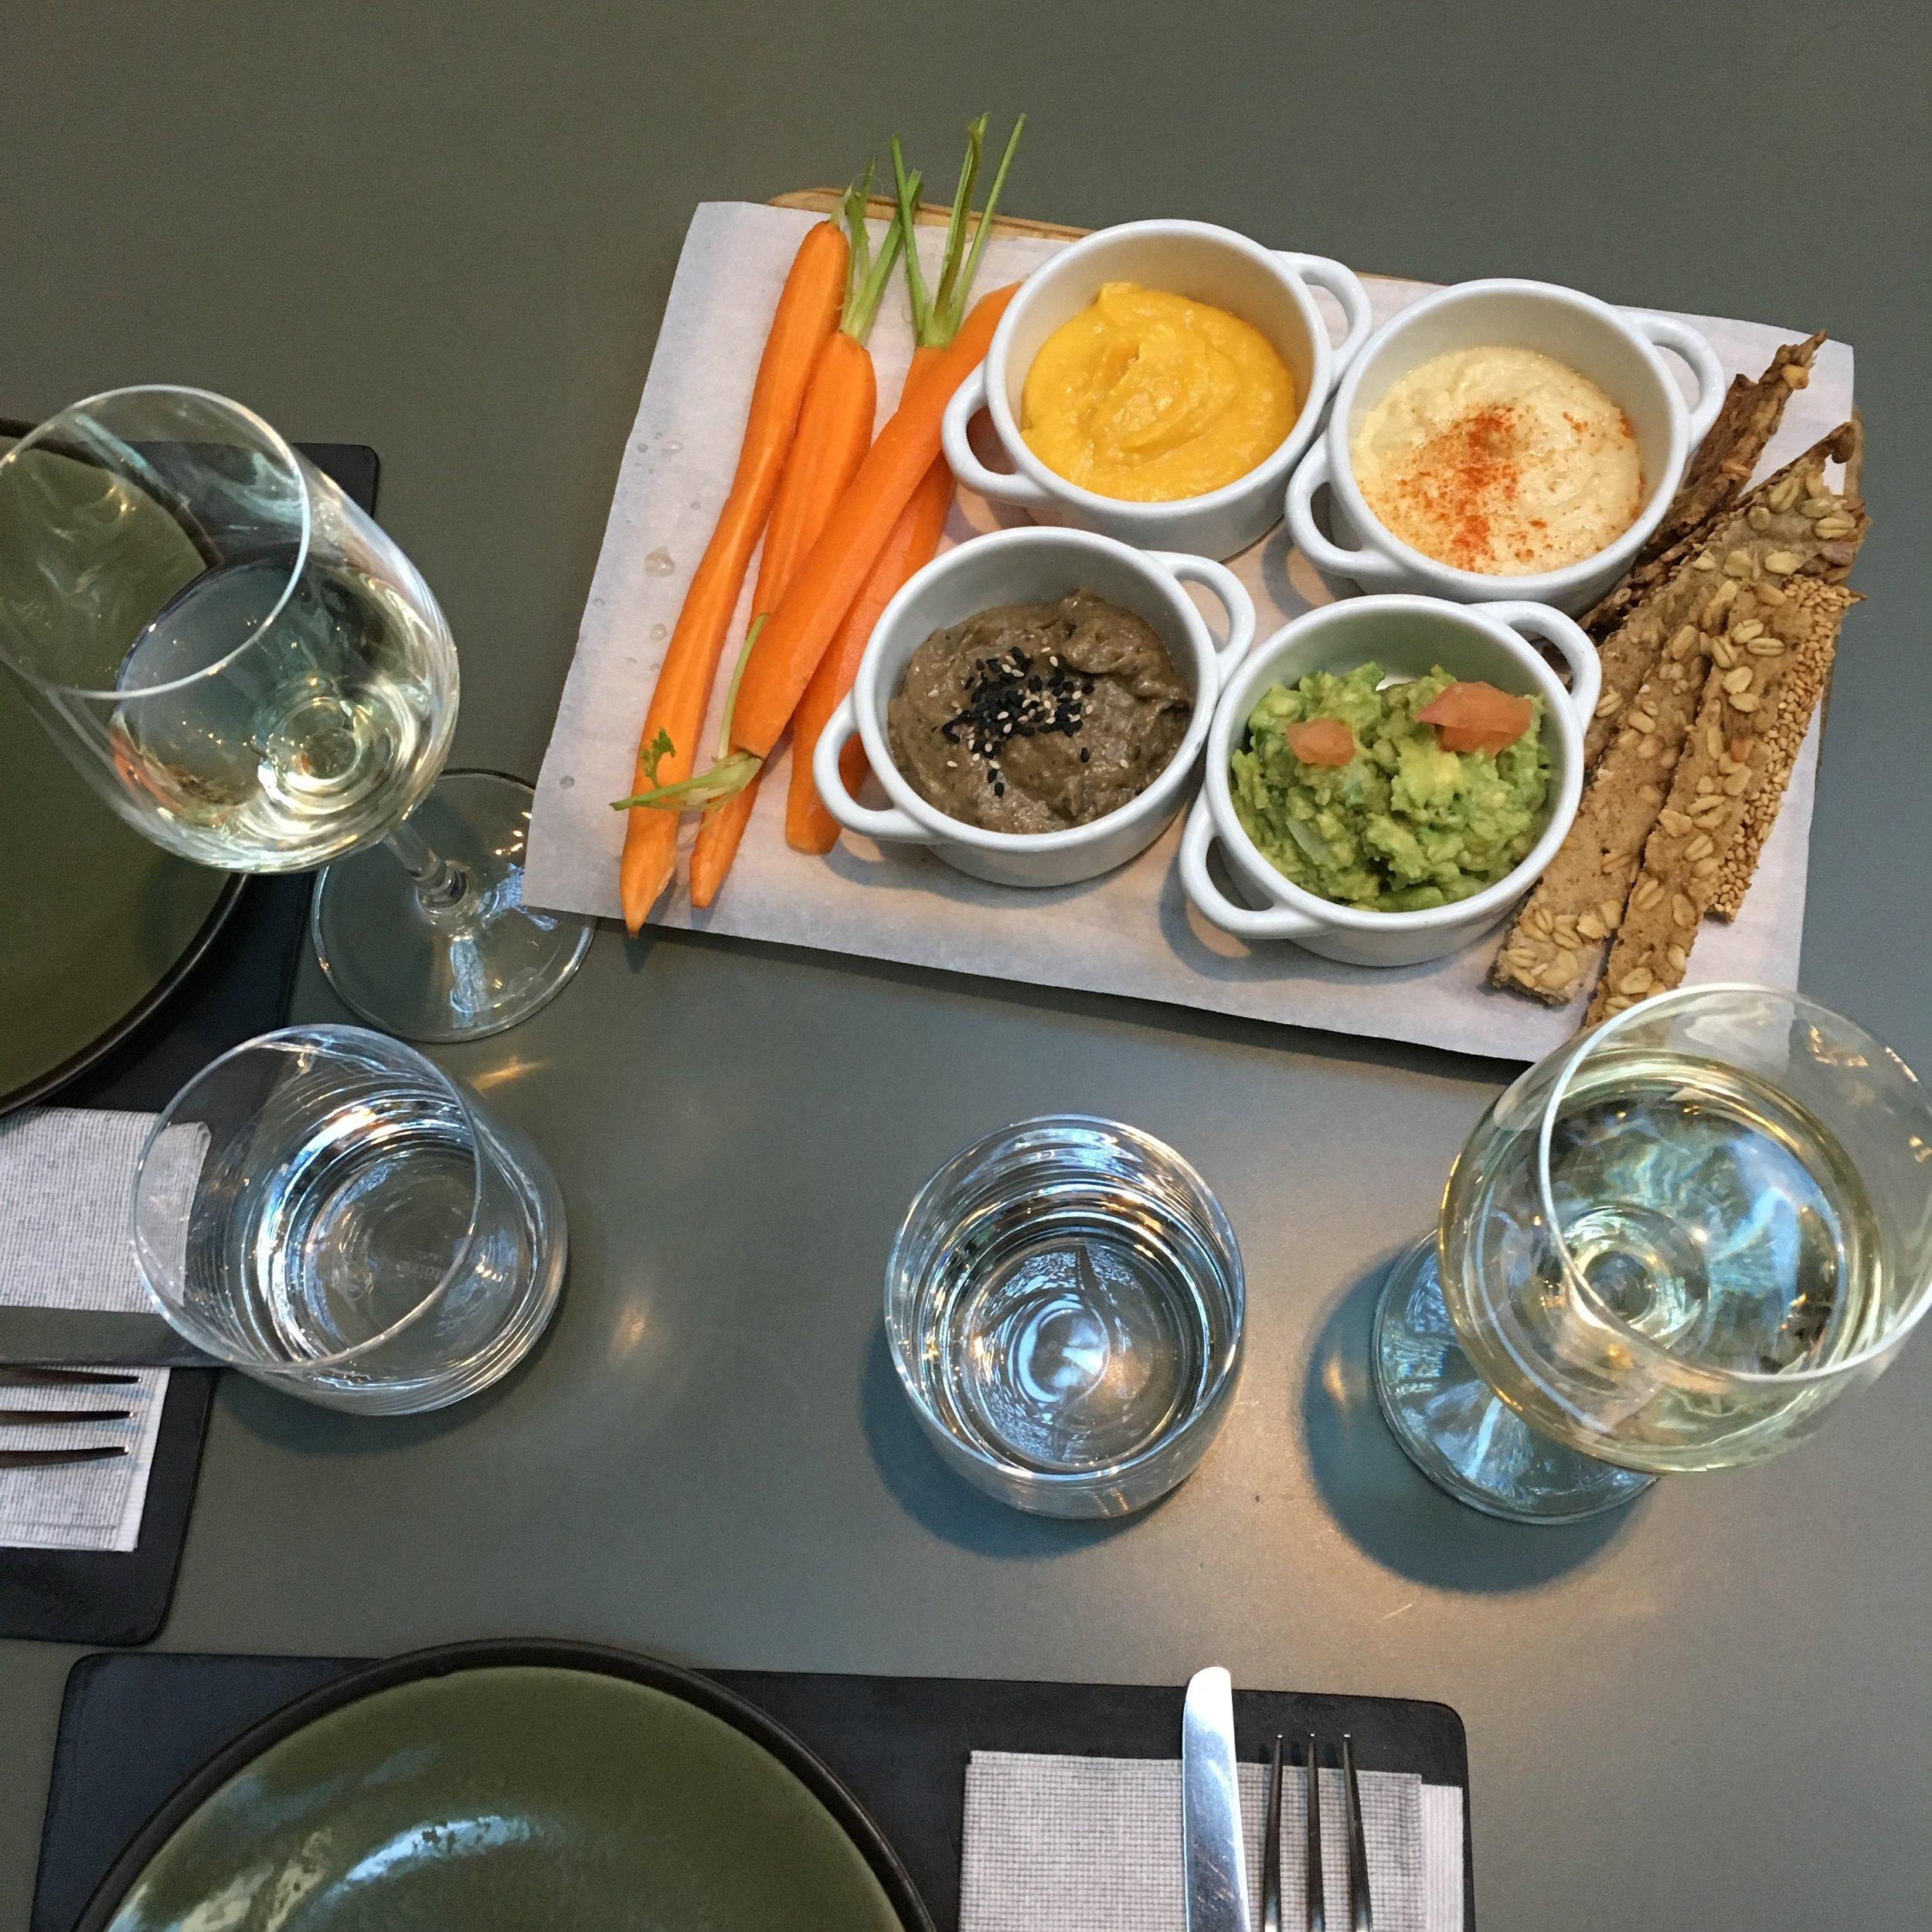 Mordisco in Barcelona. Hummus, Guacamole, Eggplant and more delicious dips!